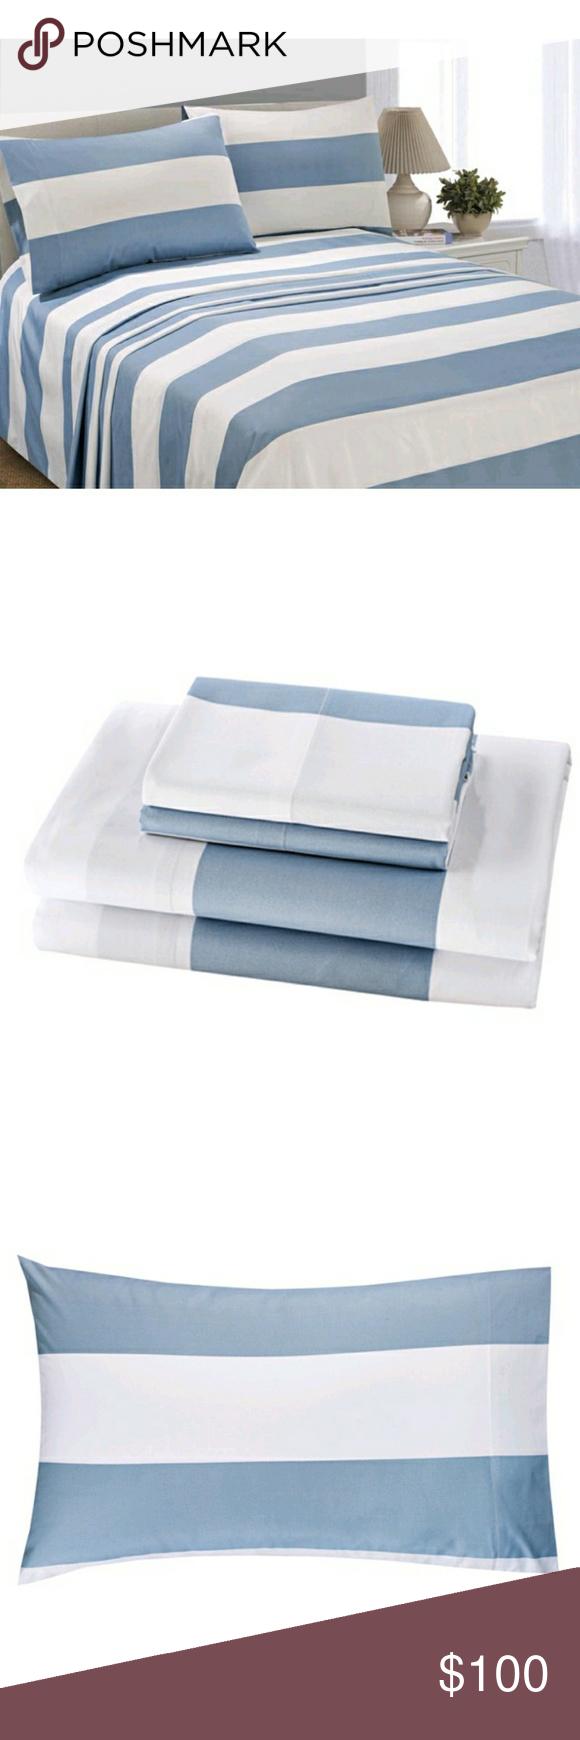 Blue Stripe Microfiber King Sheet Set King sheet sets